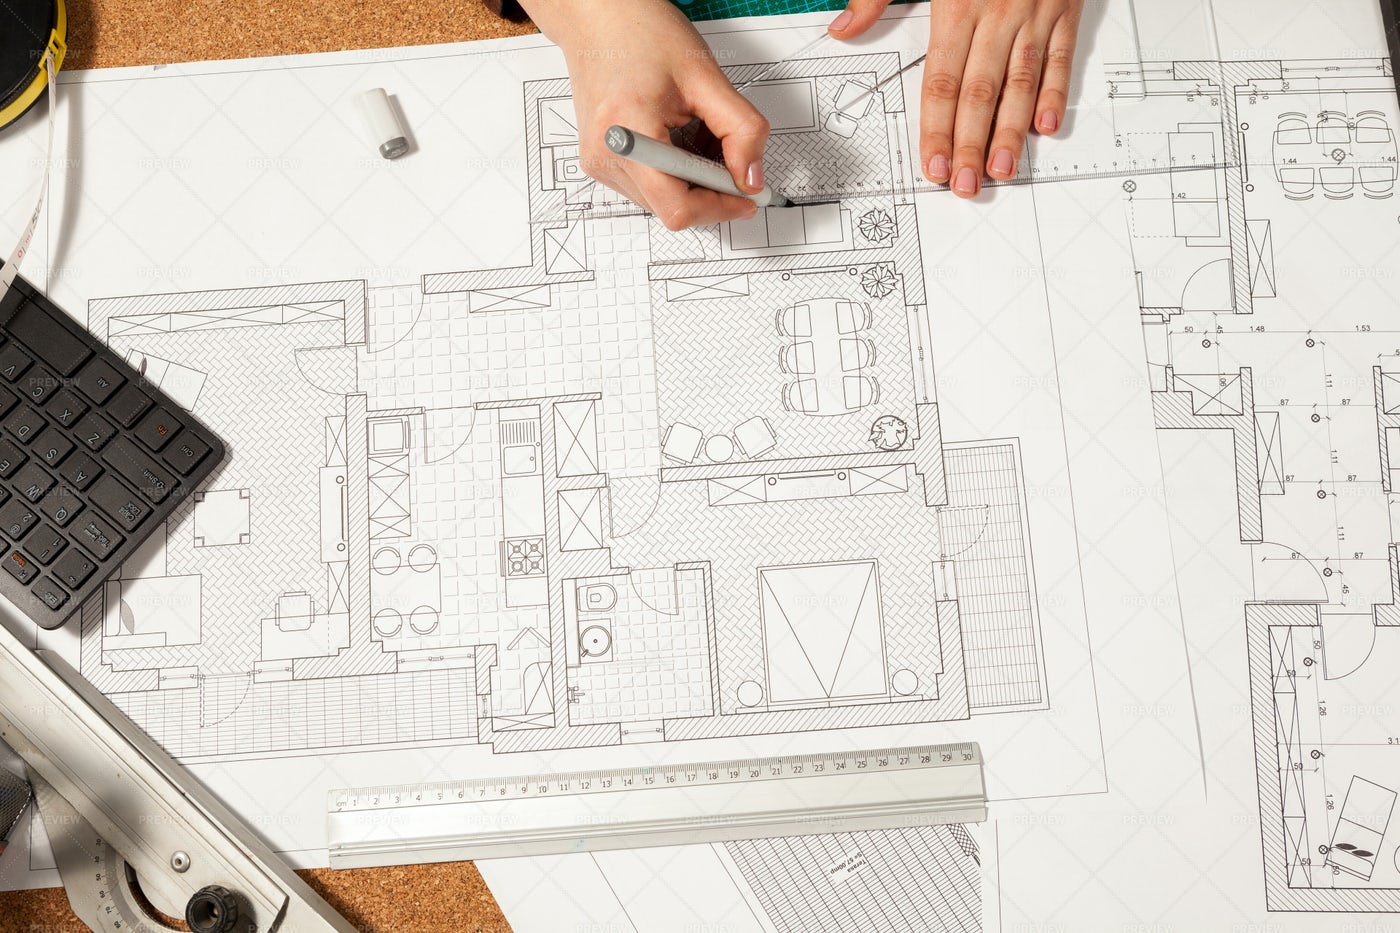 Architect Works On Blueprints: Stock Photos